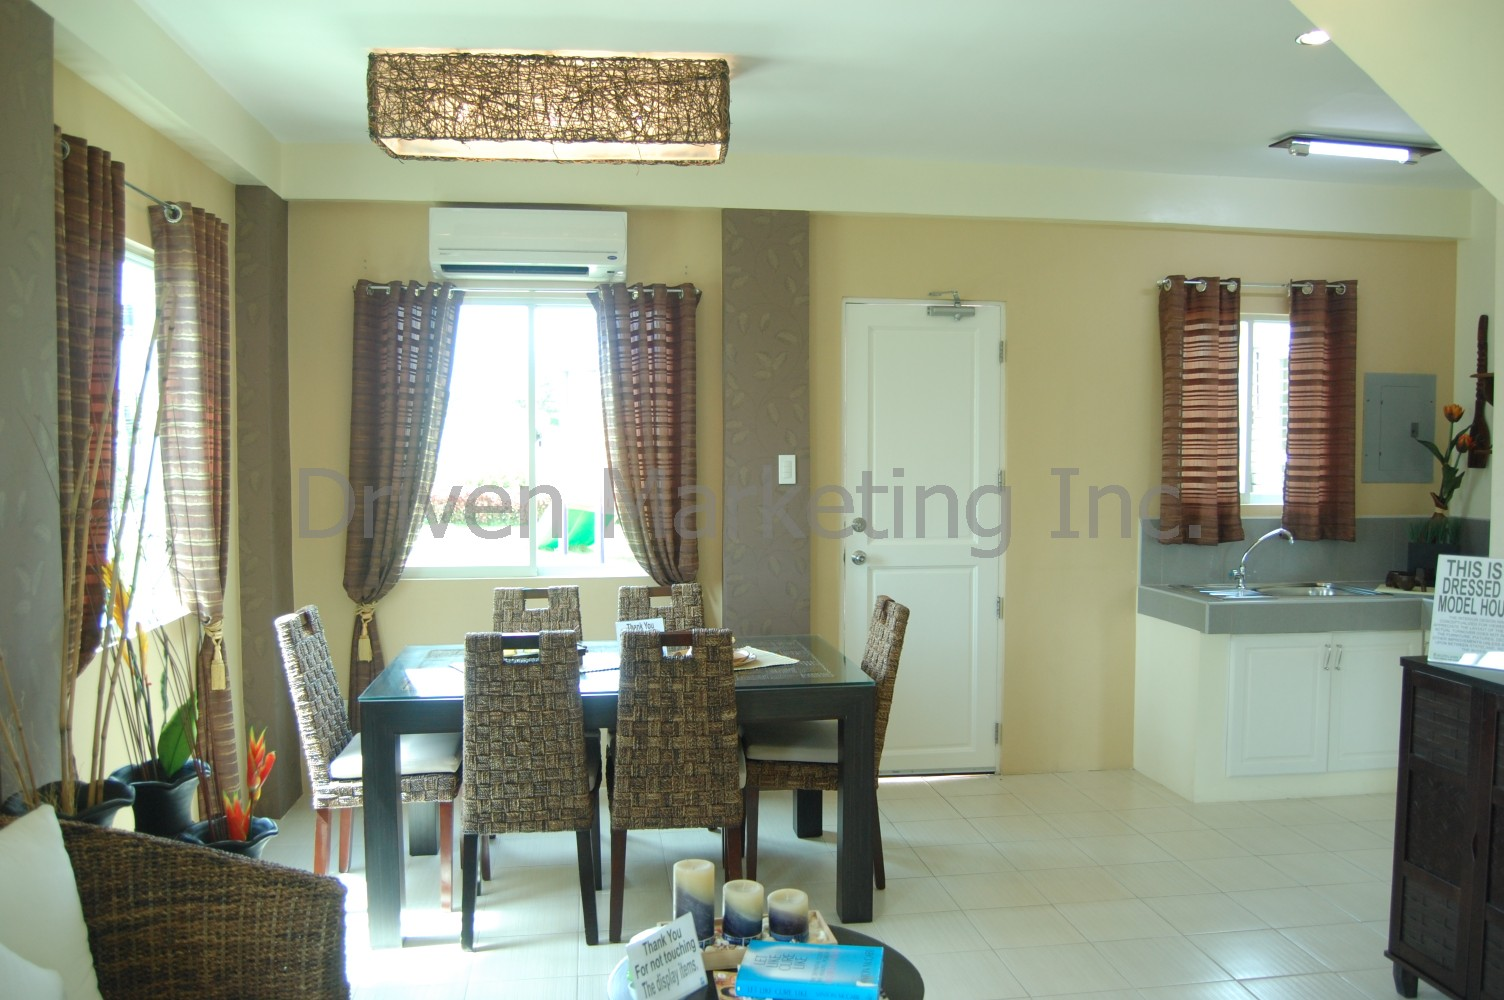 Washington place dasmarinas dasma cavite philippines modern house design affordable rent to own wynnie 10 jpg